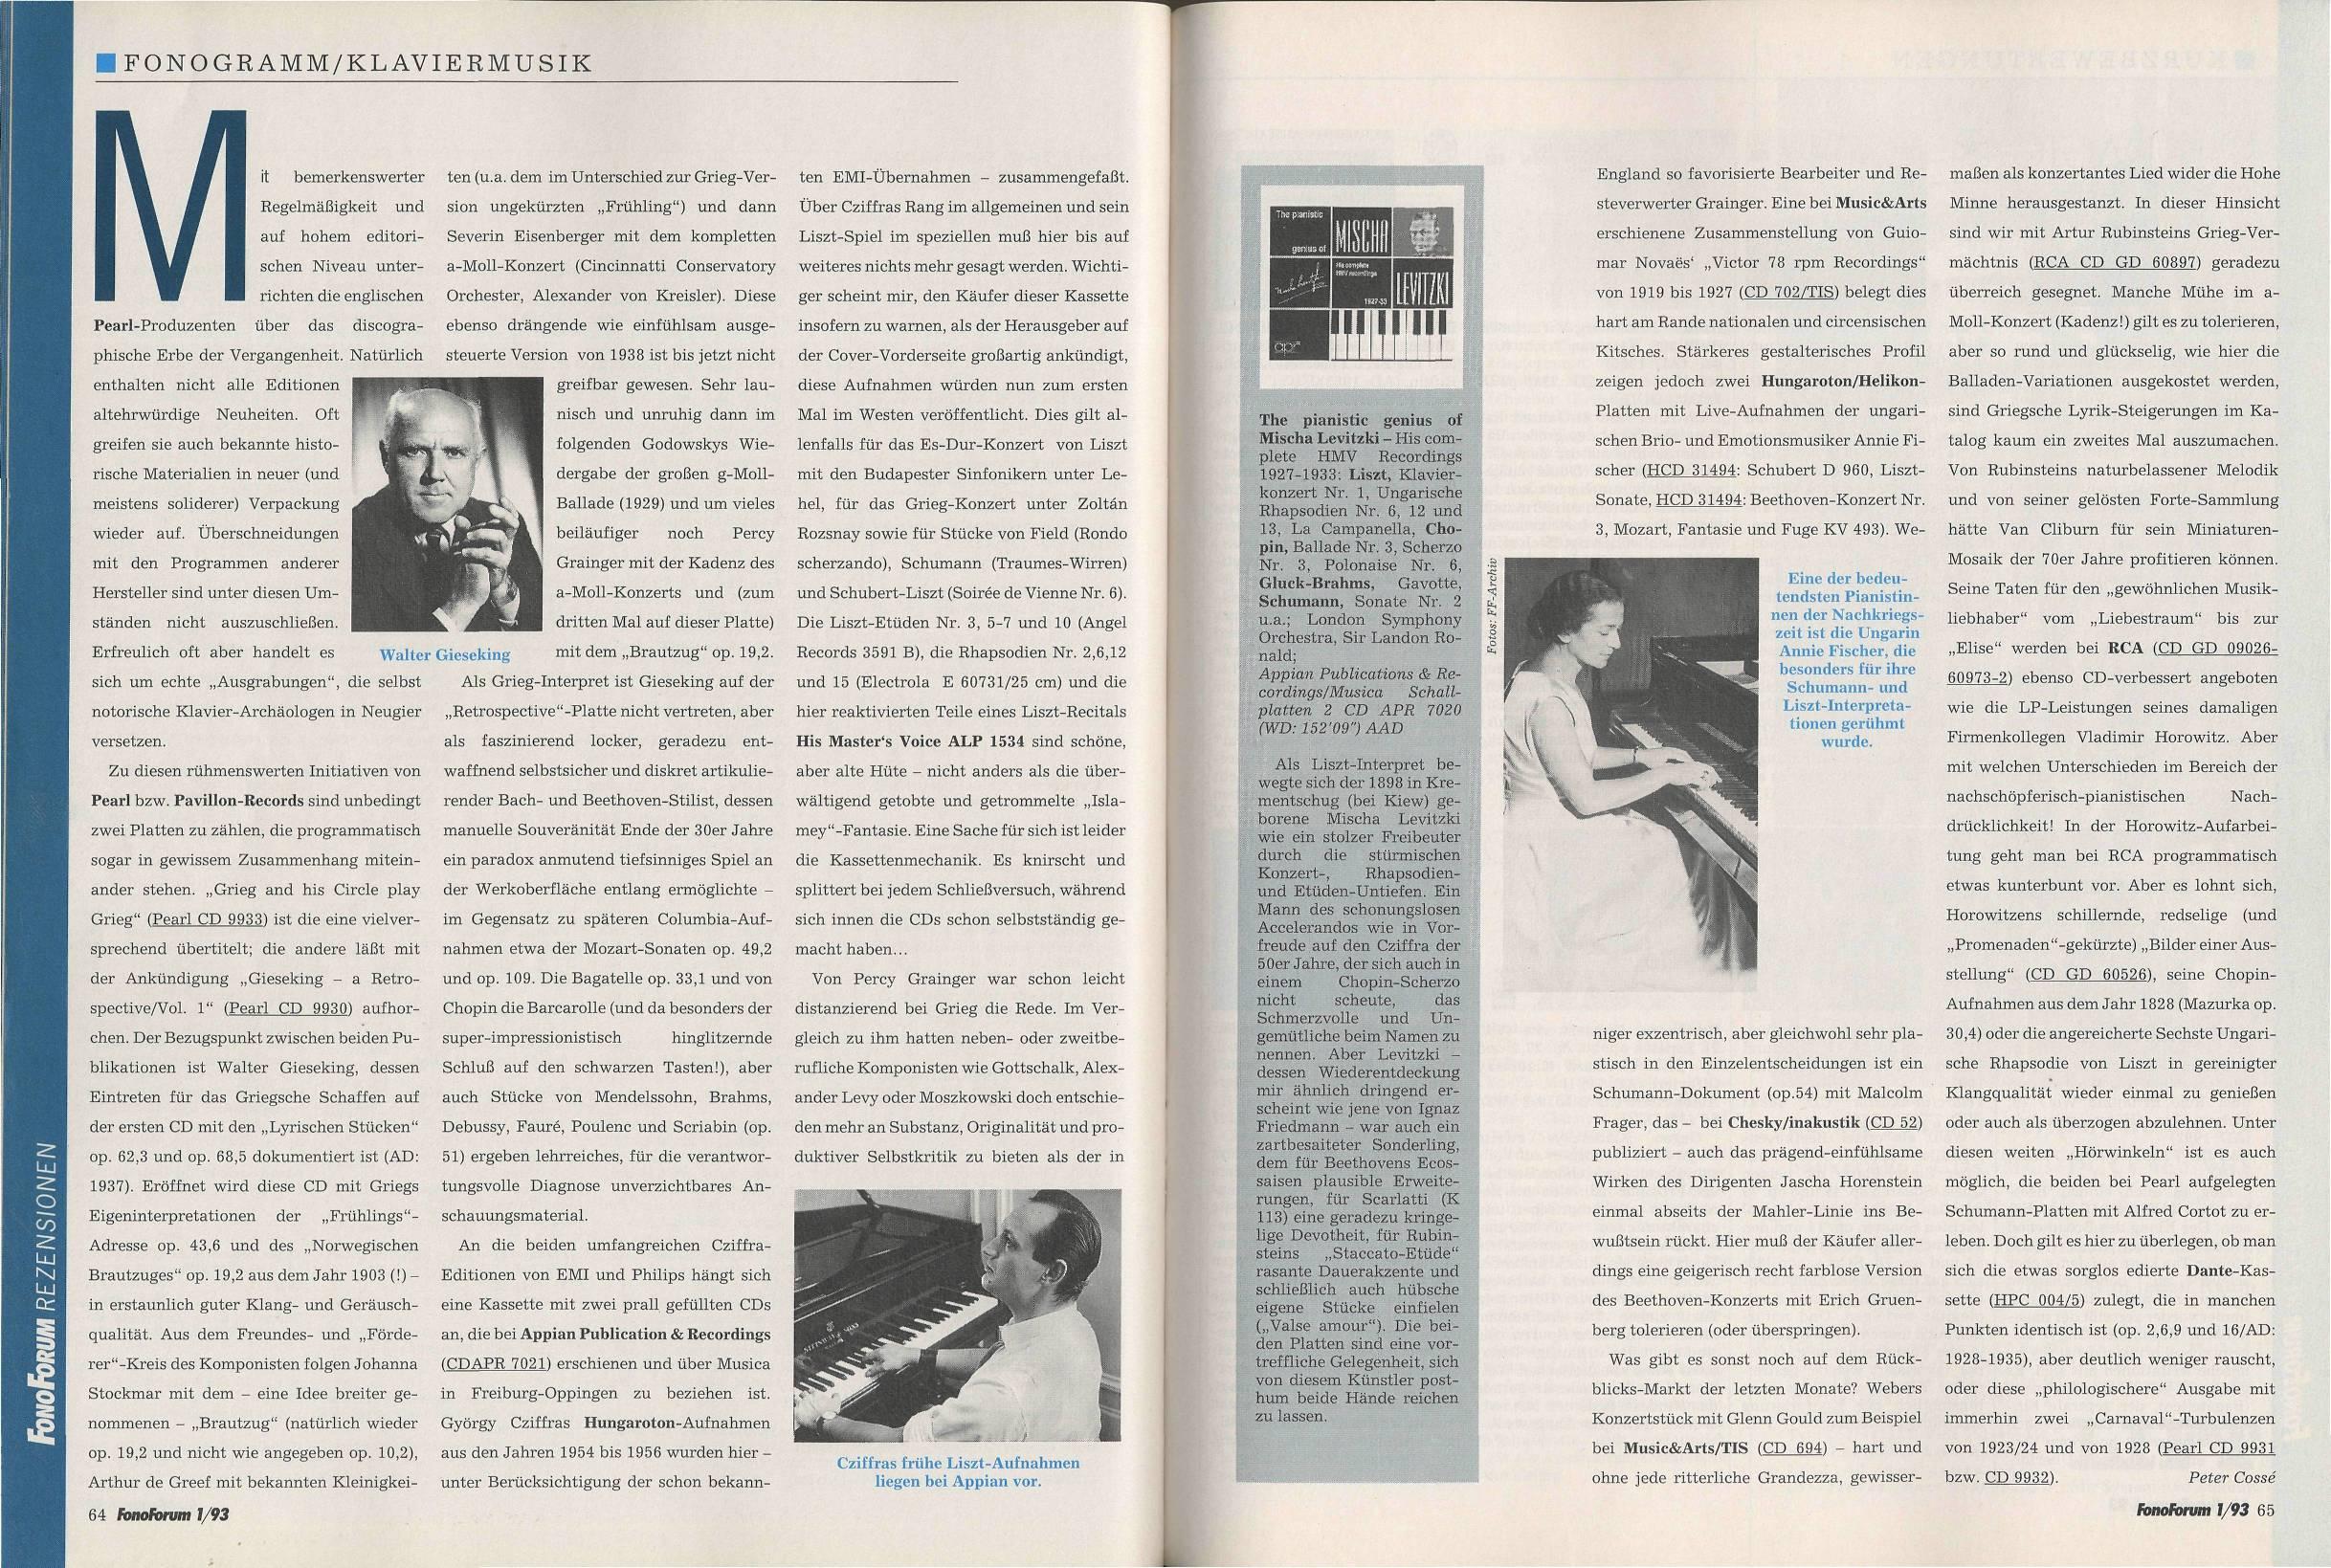 Fonogramm/Klaviermusik